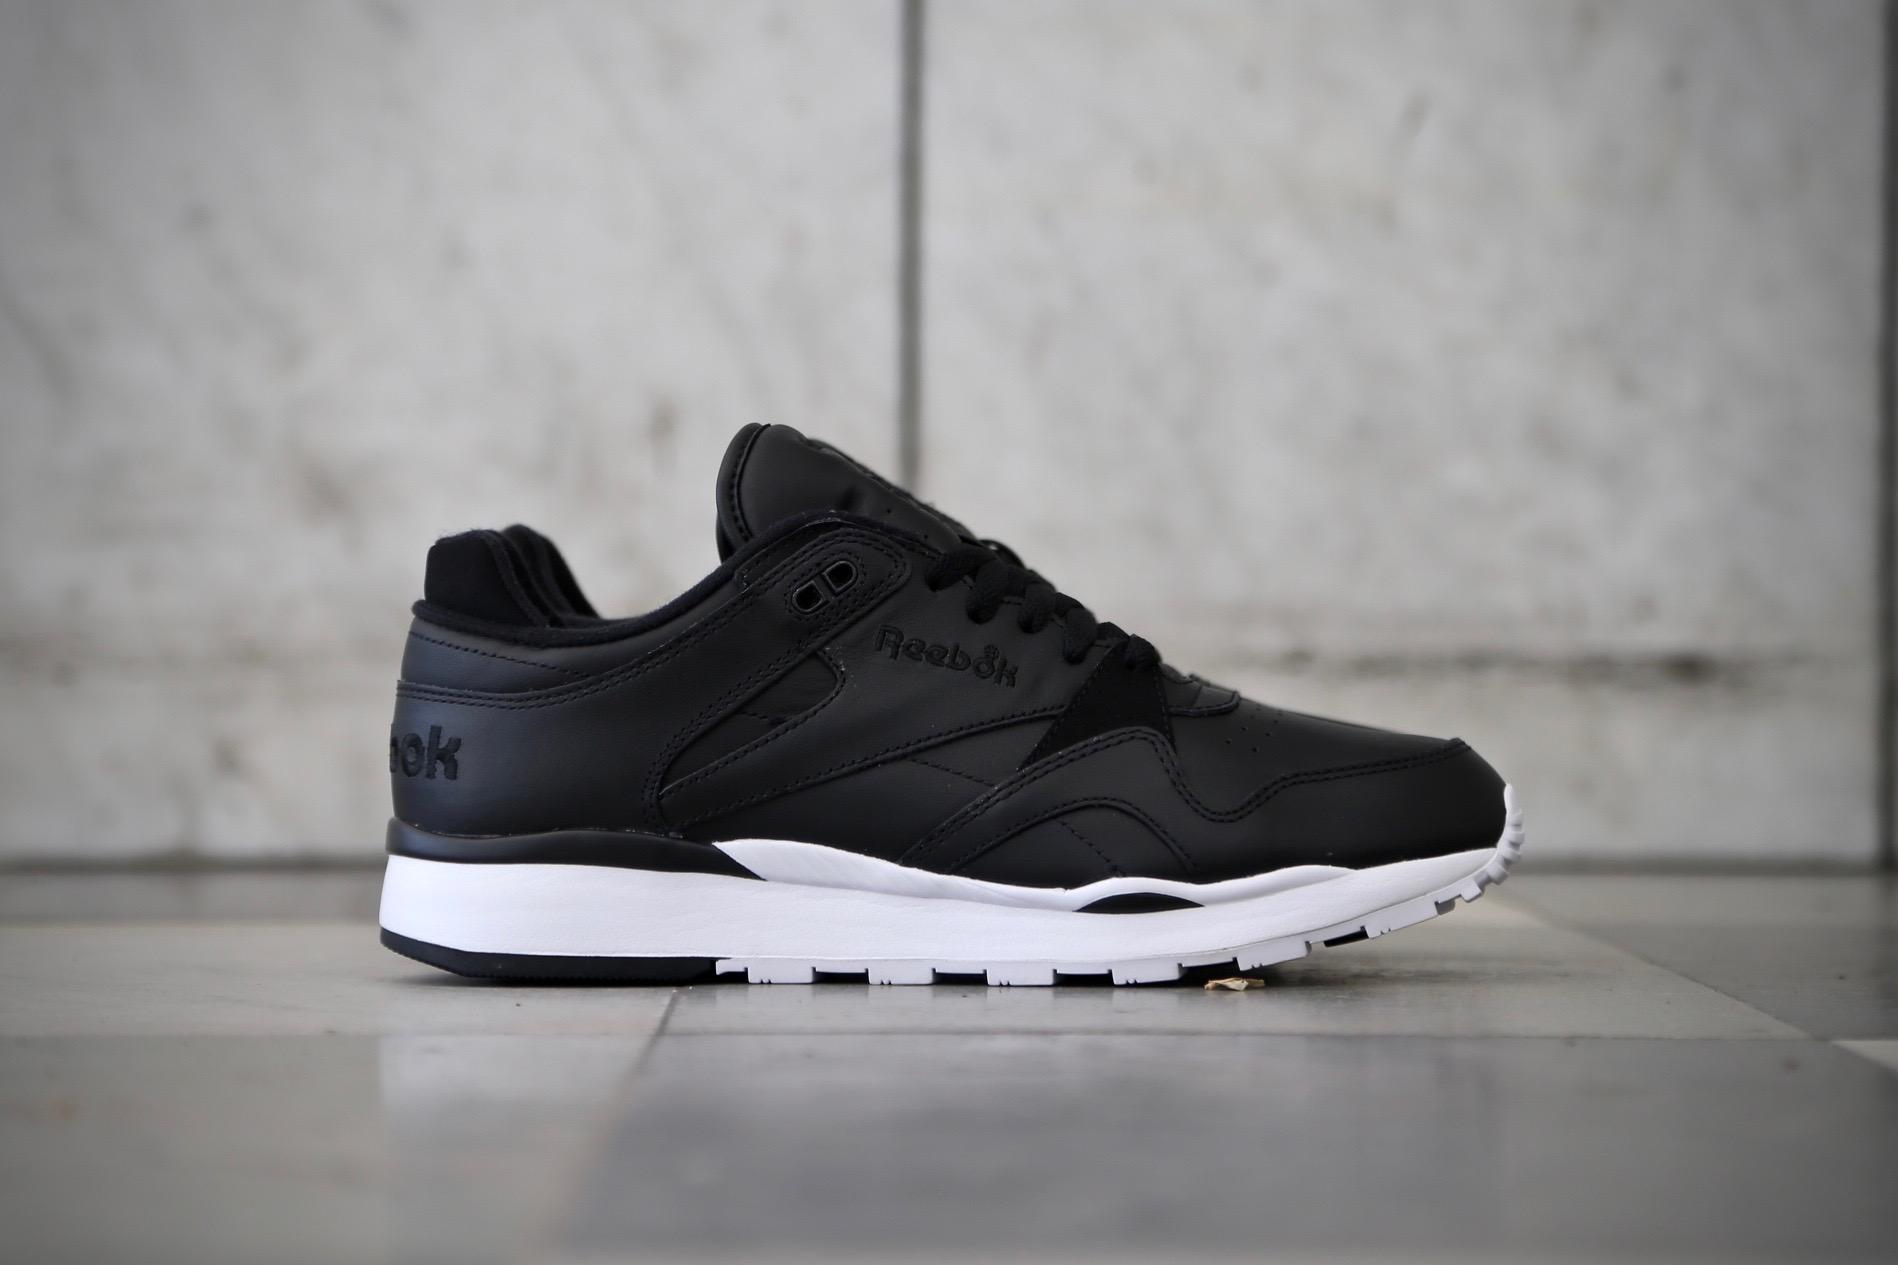 046b8cfb2e8 Reebok CL Leather II – Black   White – STASP